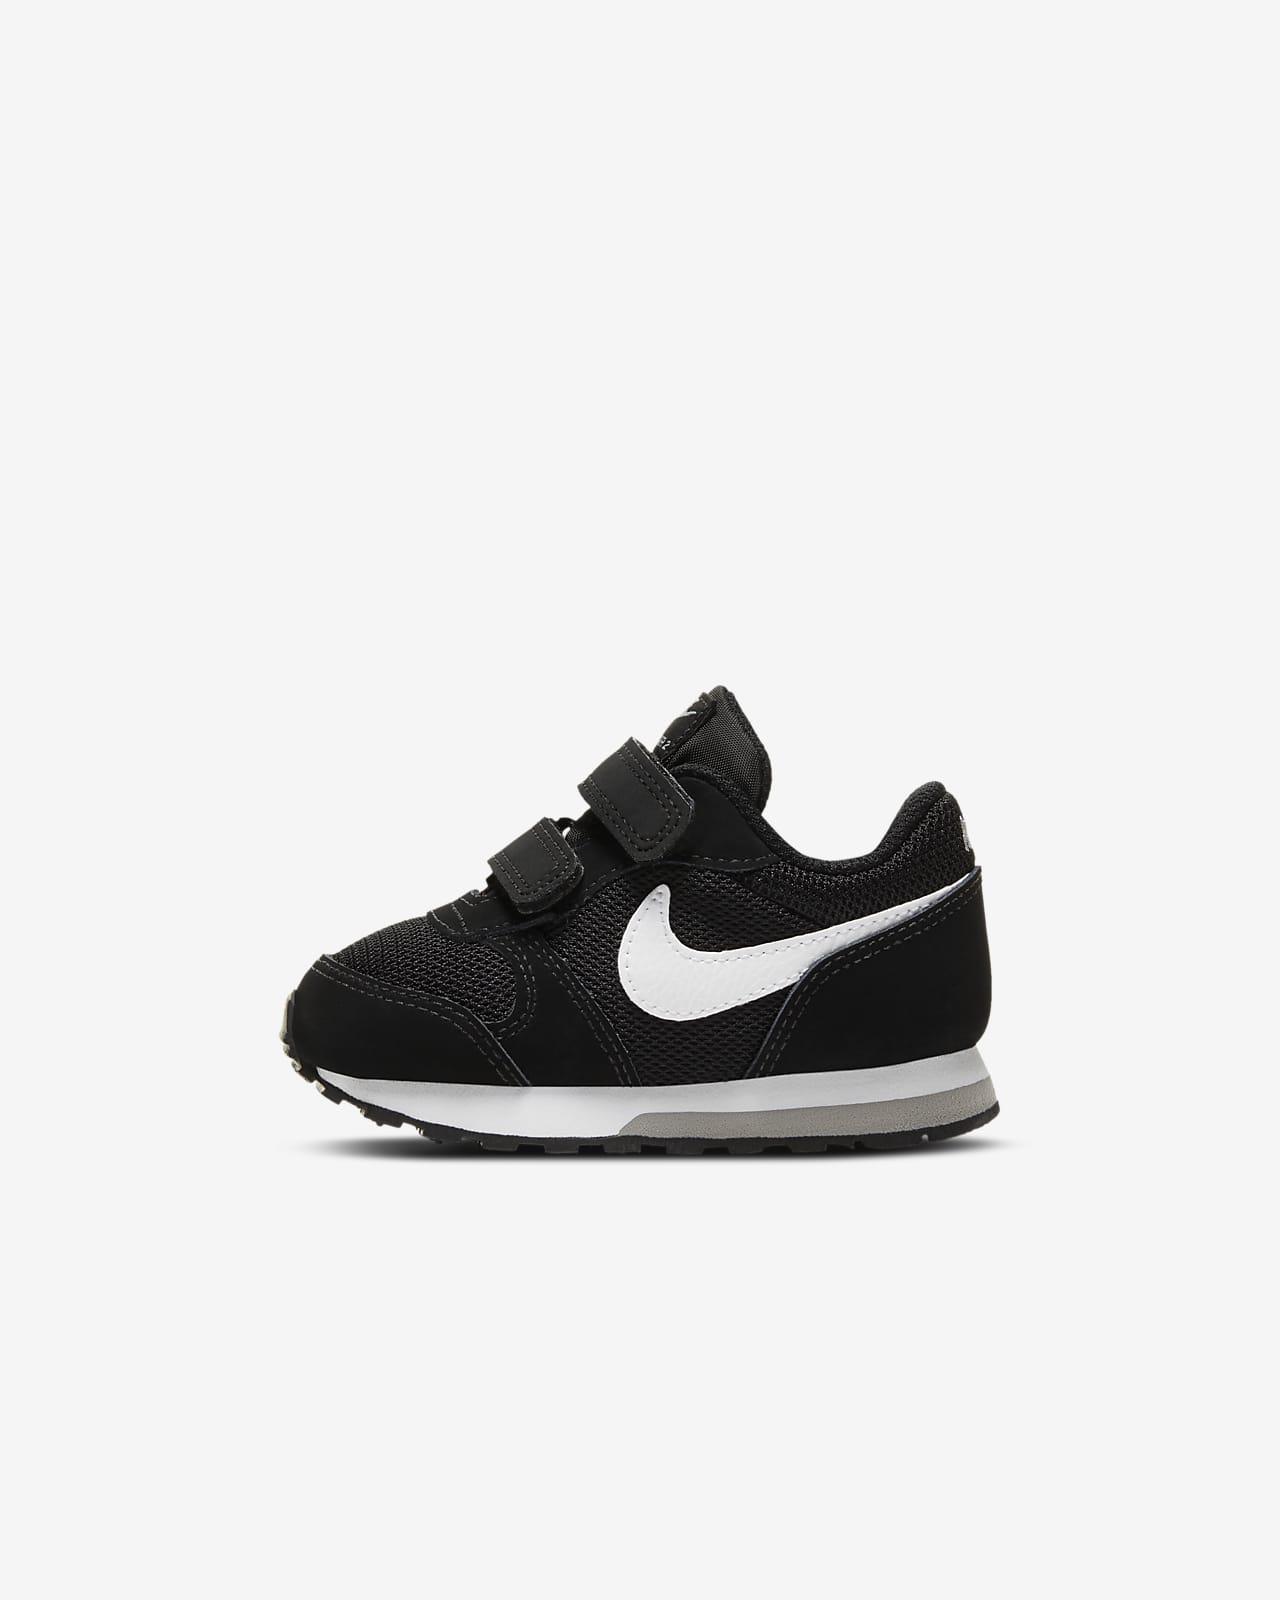 Nike MD Runner 2 Baby/Toddler Shoe